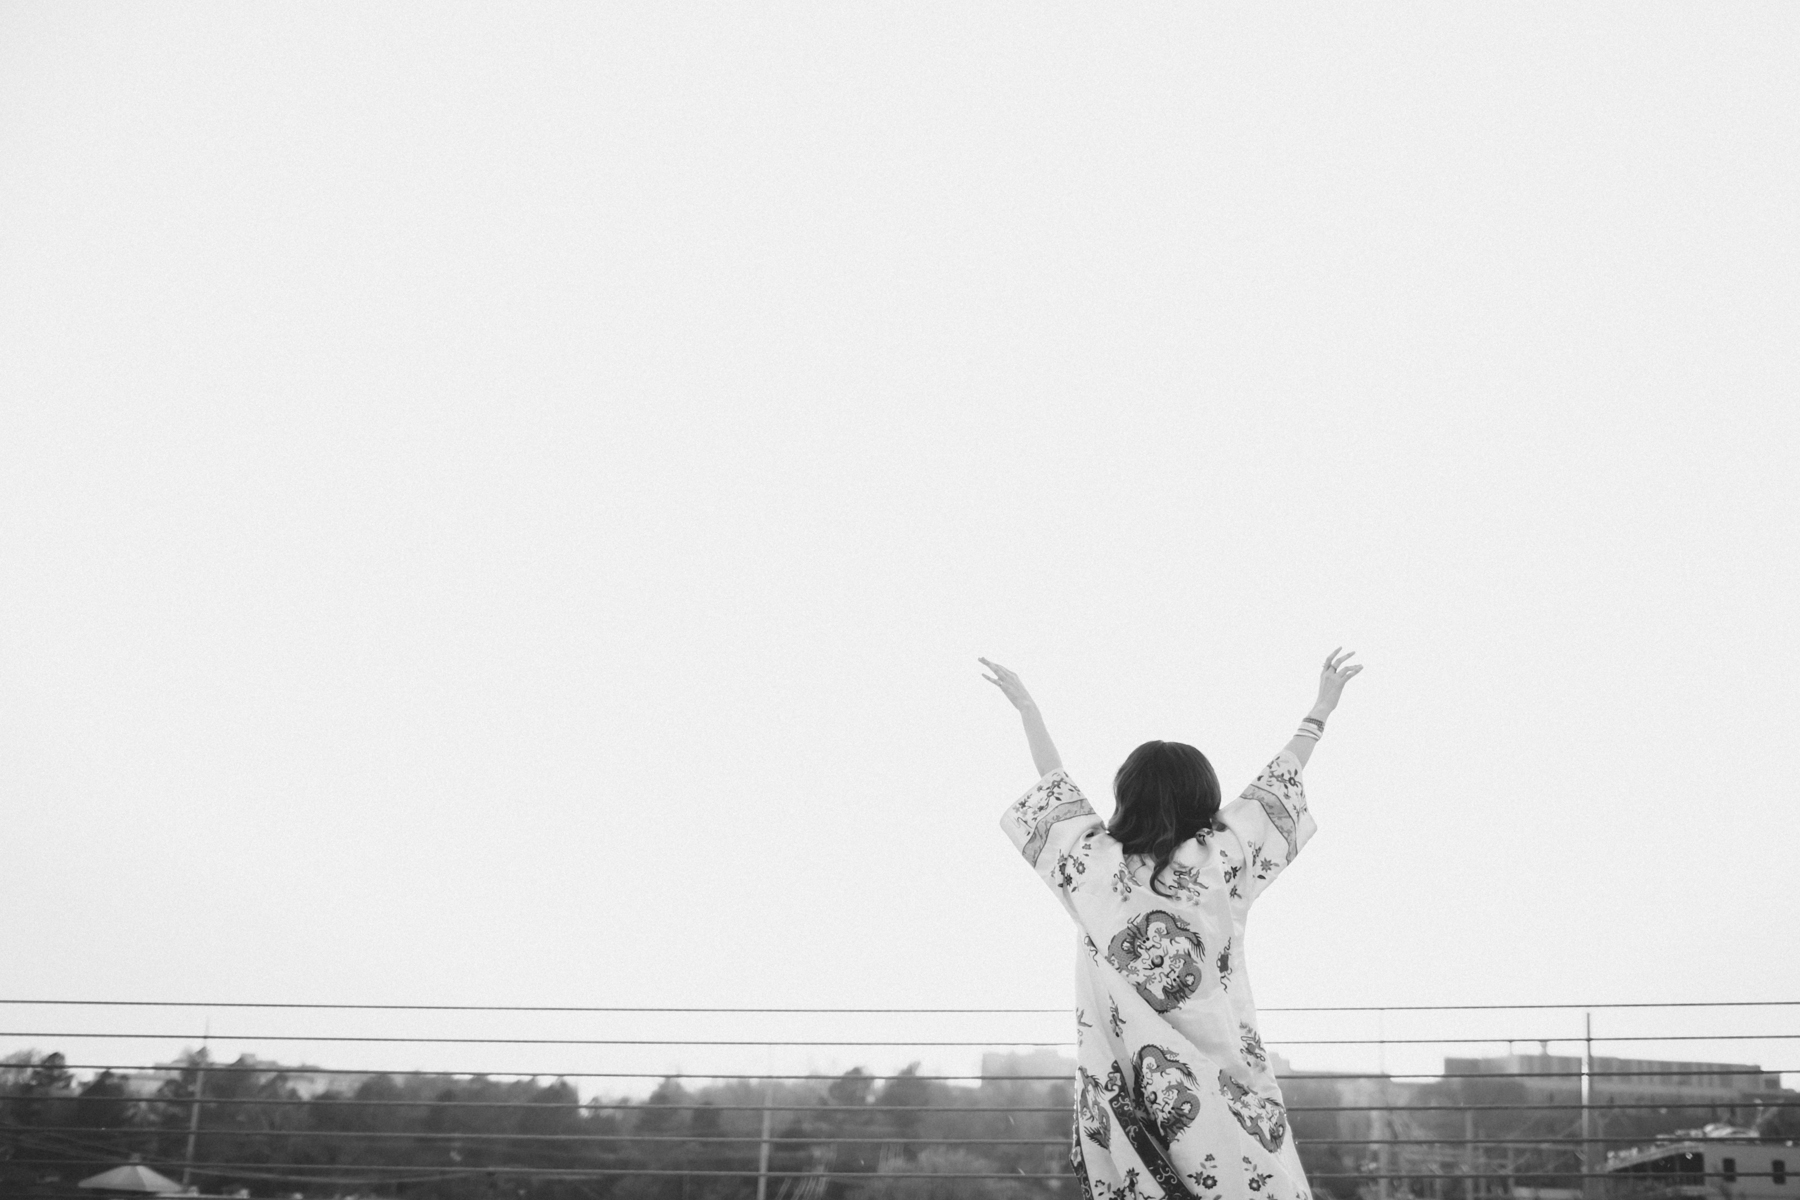 Eldridge_Edit_Anna_E_Cottrell_Tulip_Louise_Fashion_Blogger_Kimono_Deconstructed_Oversized_Boyfriend_Jean_Denim_Mother-White_T-shirt_Tom_Ford_Glasses_Joie_Heel_12.jpg